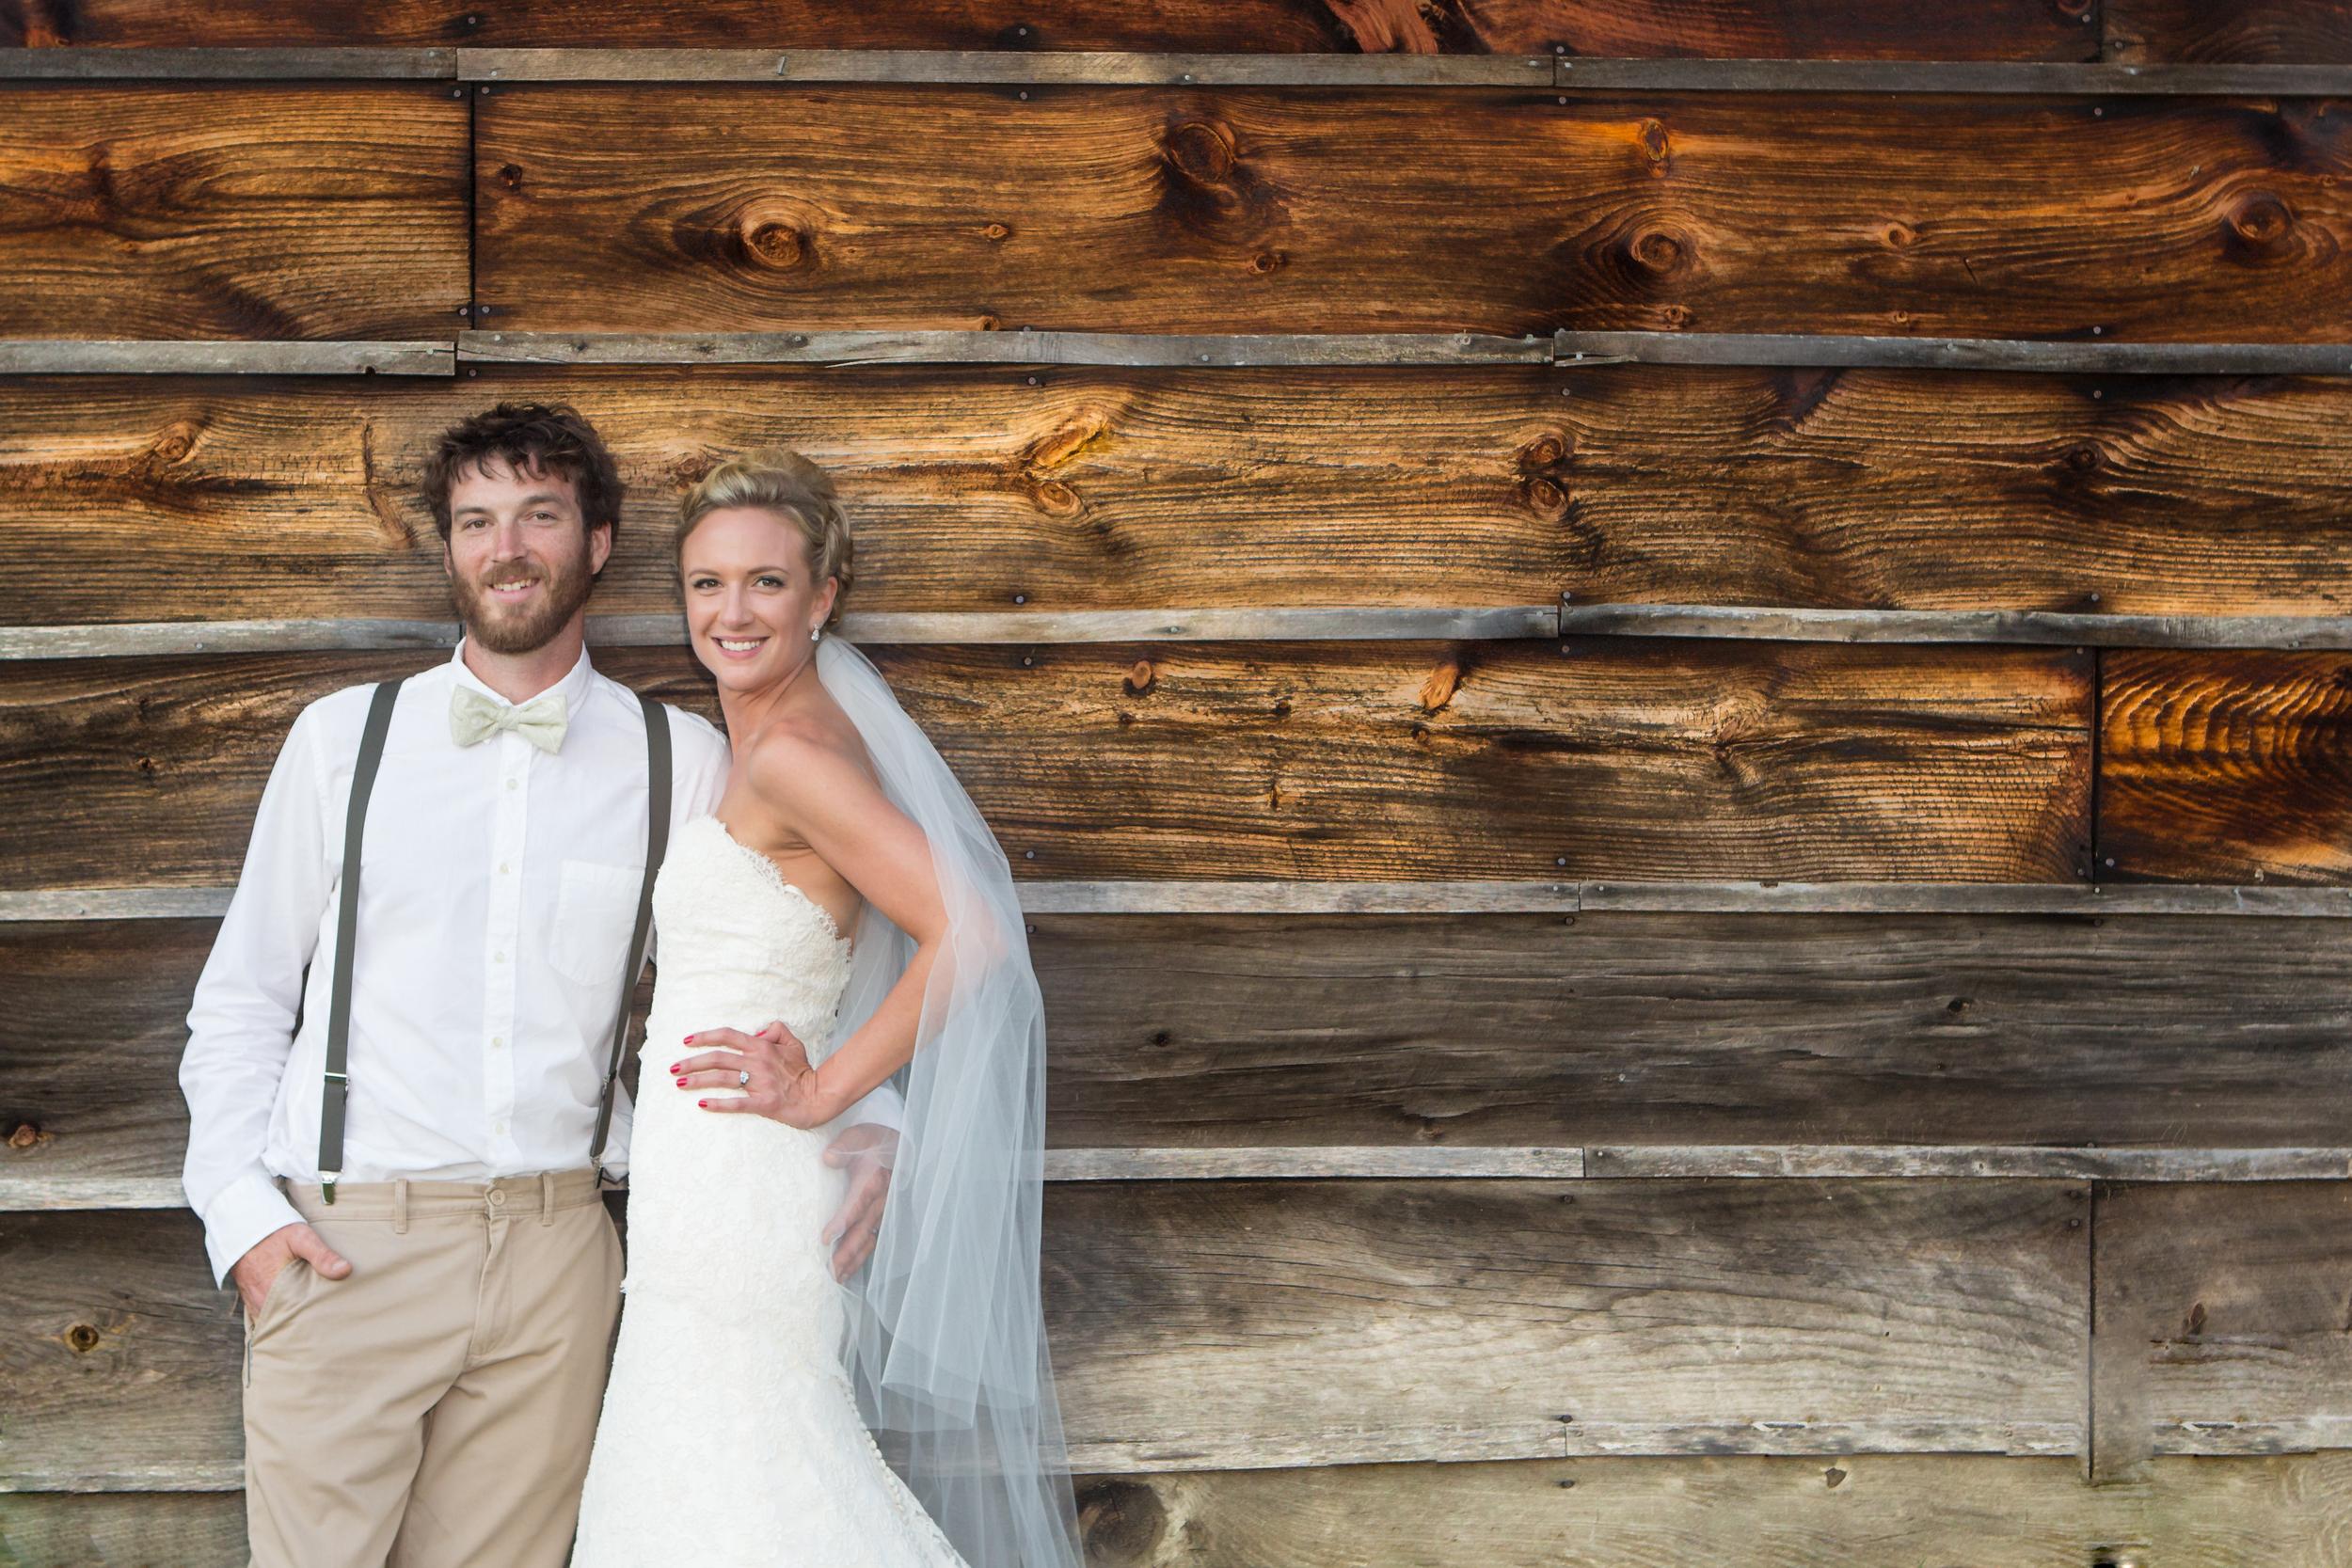 wedding bride groon old barn door .jpg